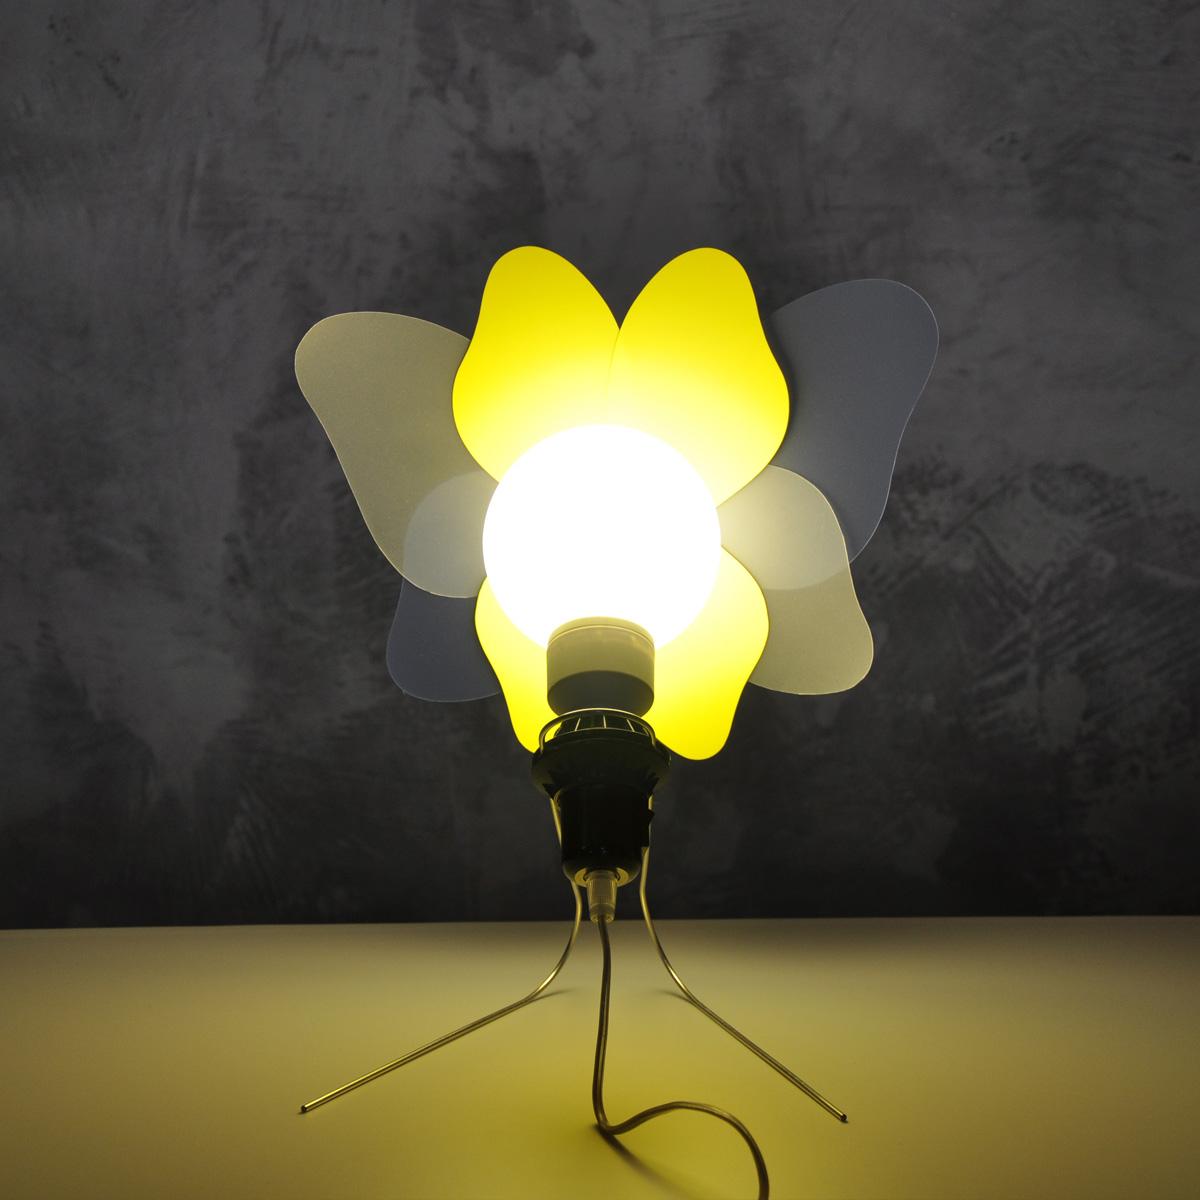 Freydenberg_Trans_Flower_Butterfly_8.jpg